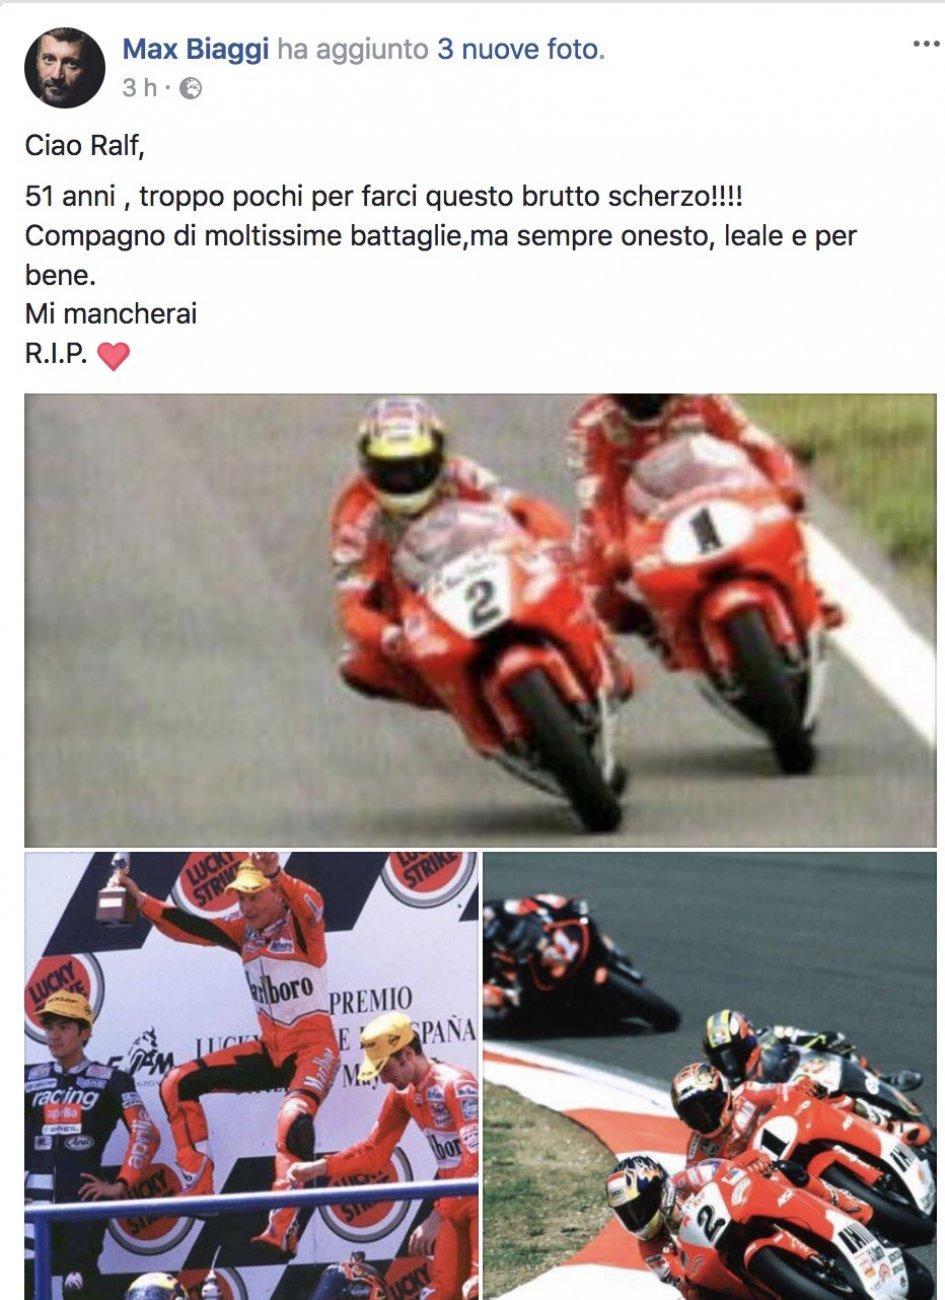 News: Biaggi, goodbye Ralf Waldmann, my friend